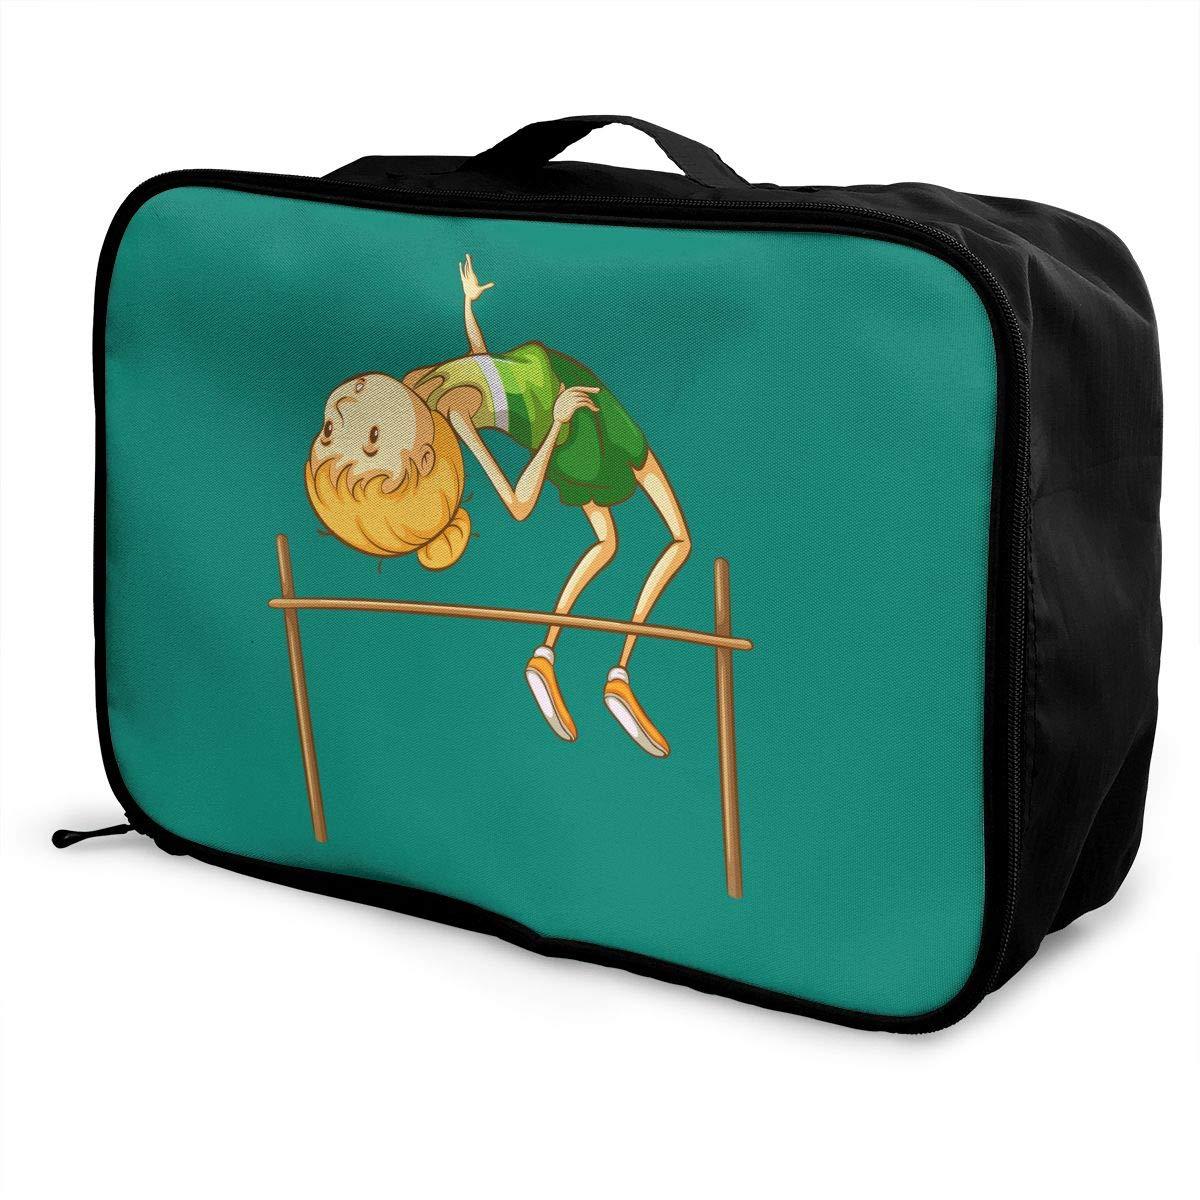 Travel Luggage Duffle Bag Lightweight Portable Handbag High Jump Large Capacity Waterproof Foldable Storage Tote